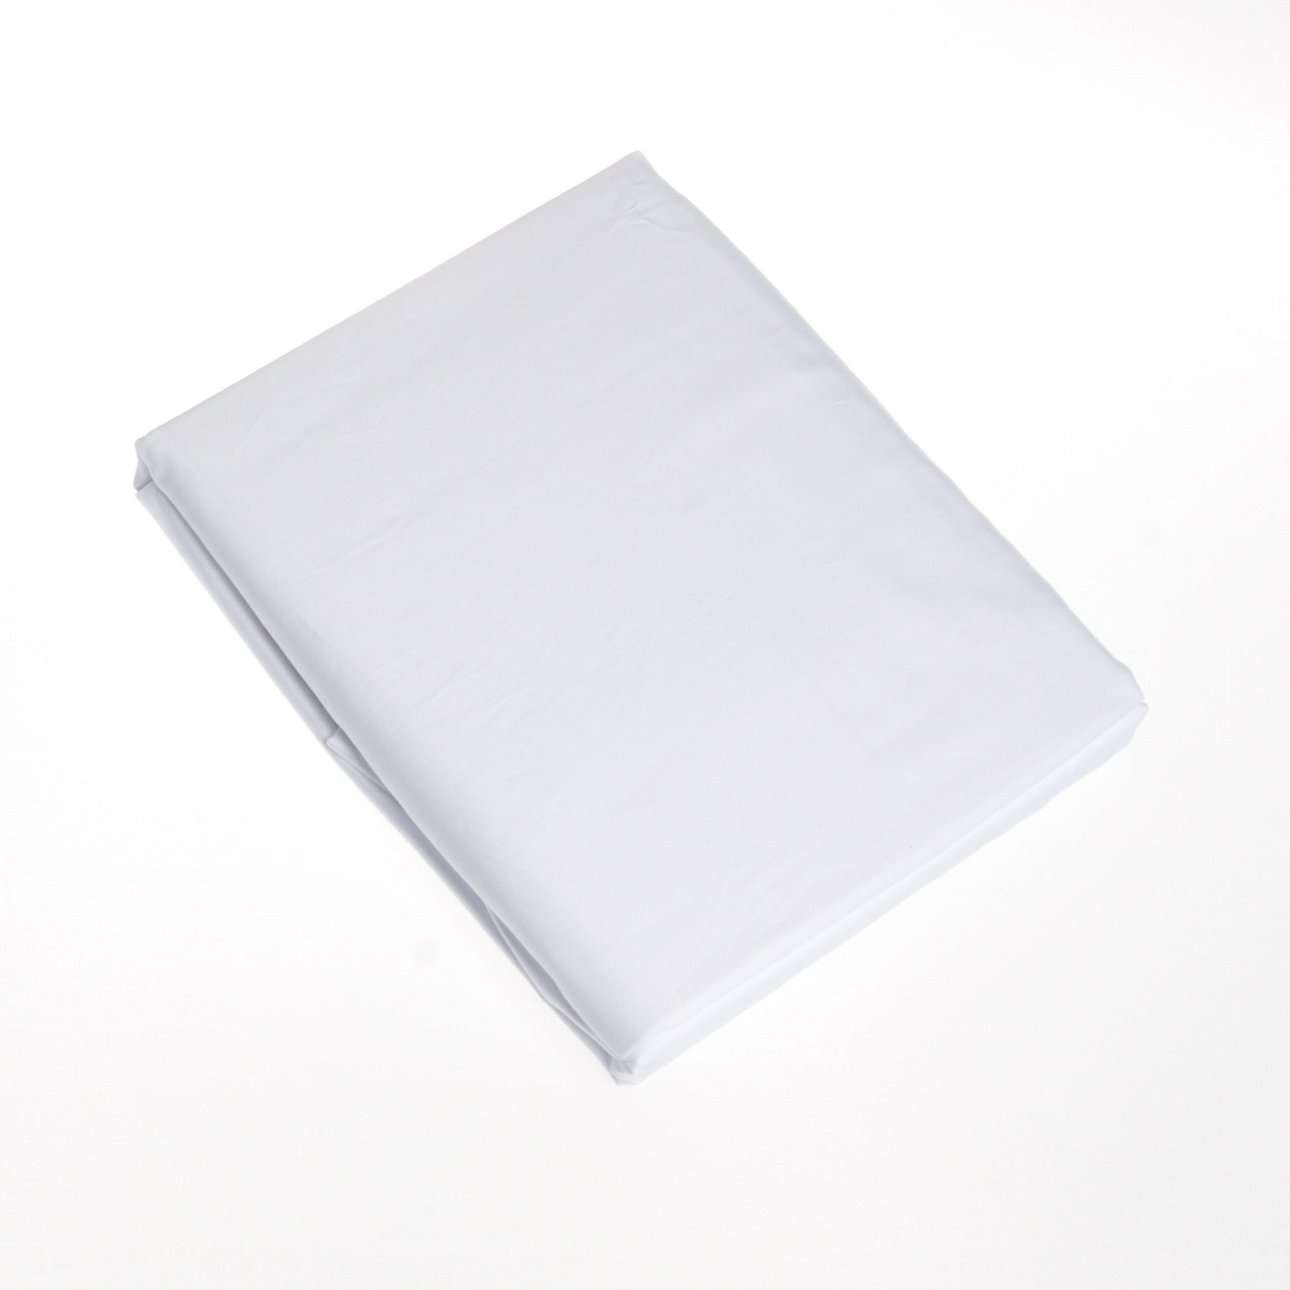 Prostěradlo satén bílé pružné